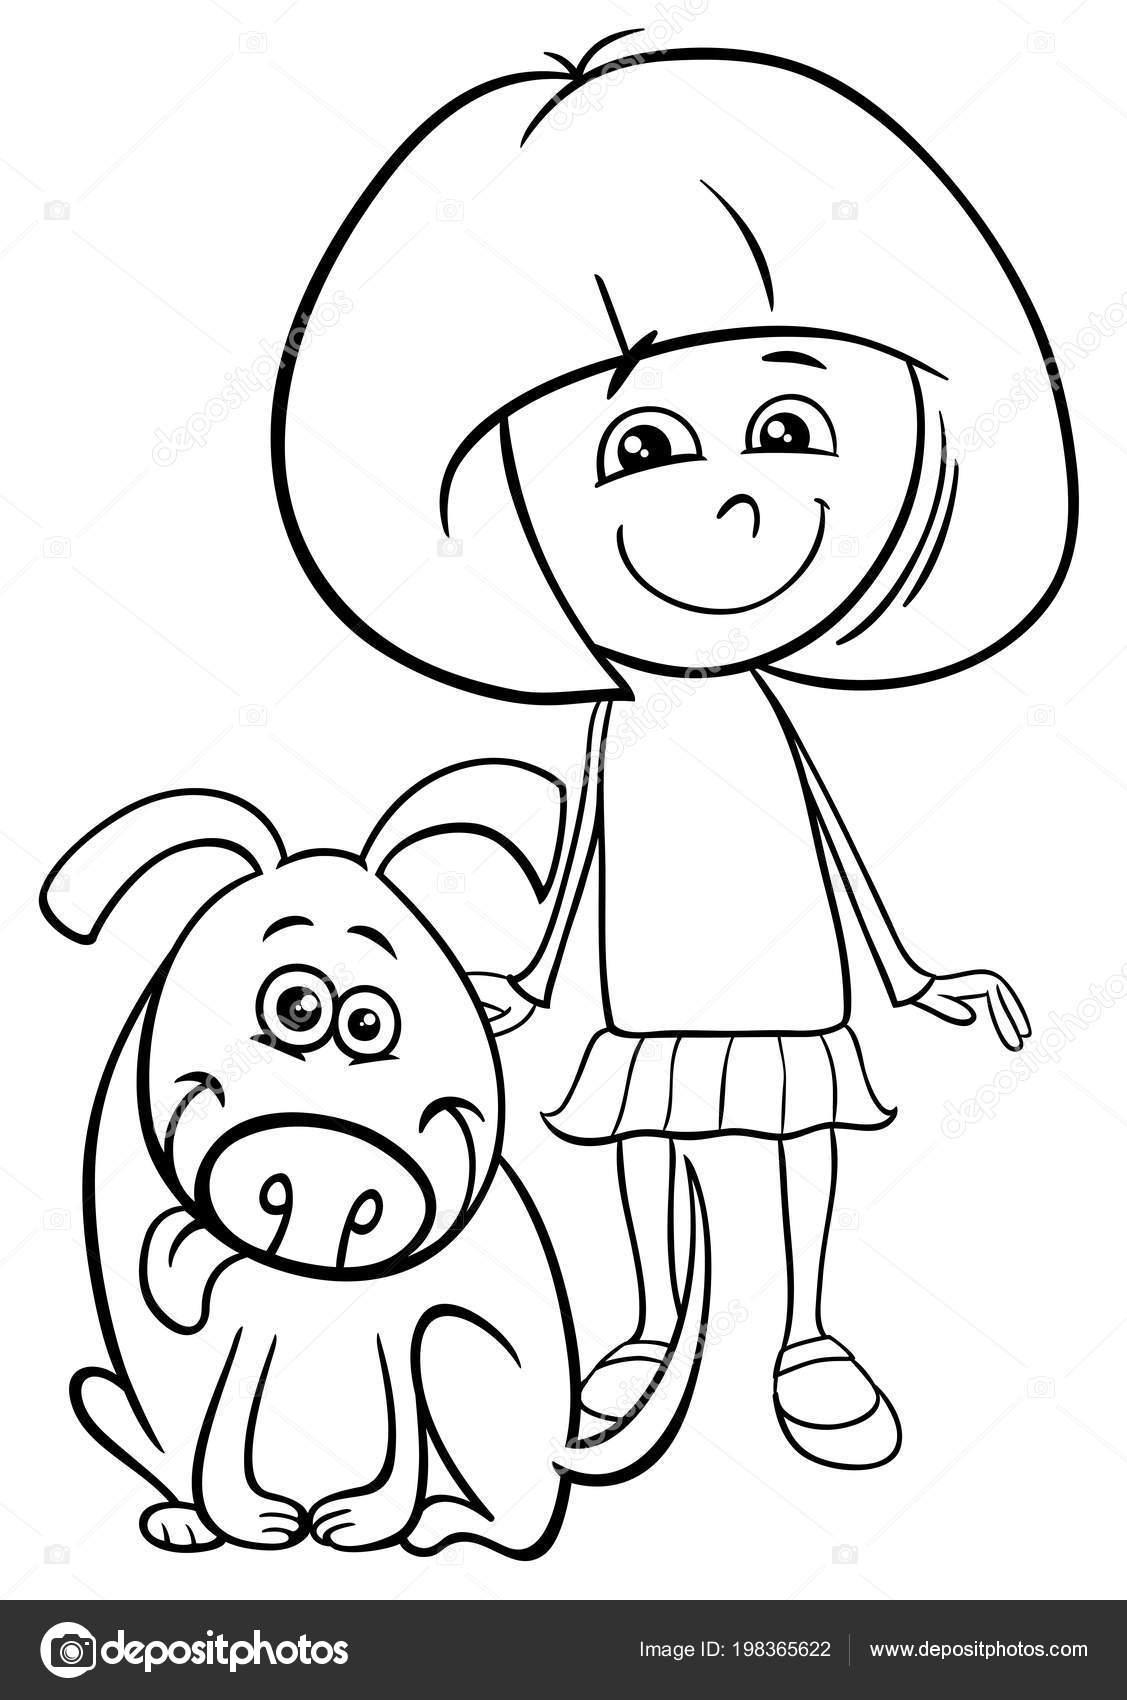 Ilustracion Dibujos Animados Blanco Negro Nino Nina Con Perro